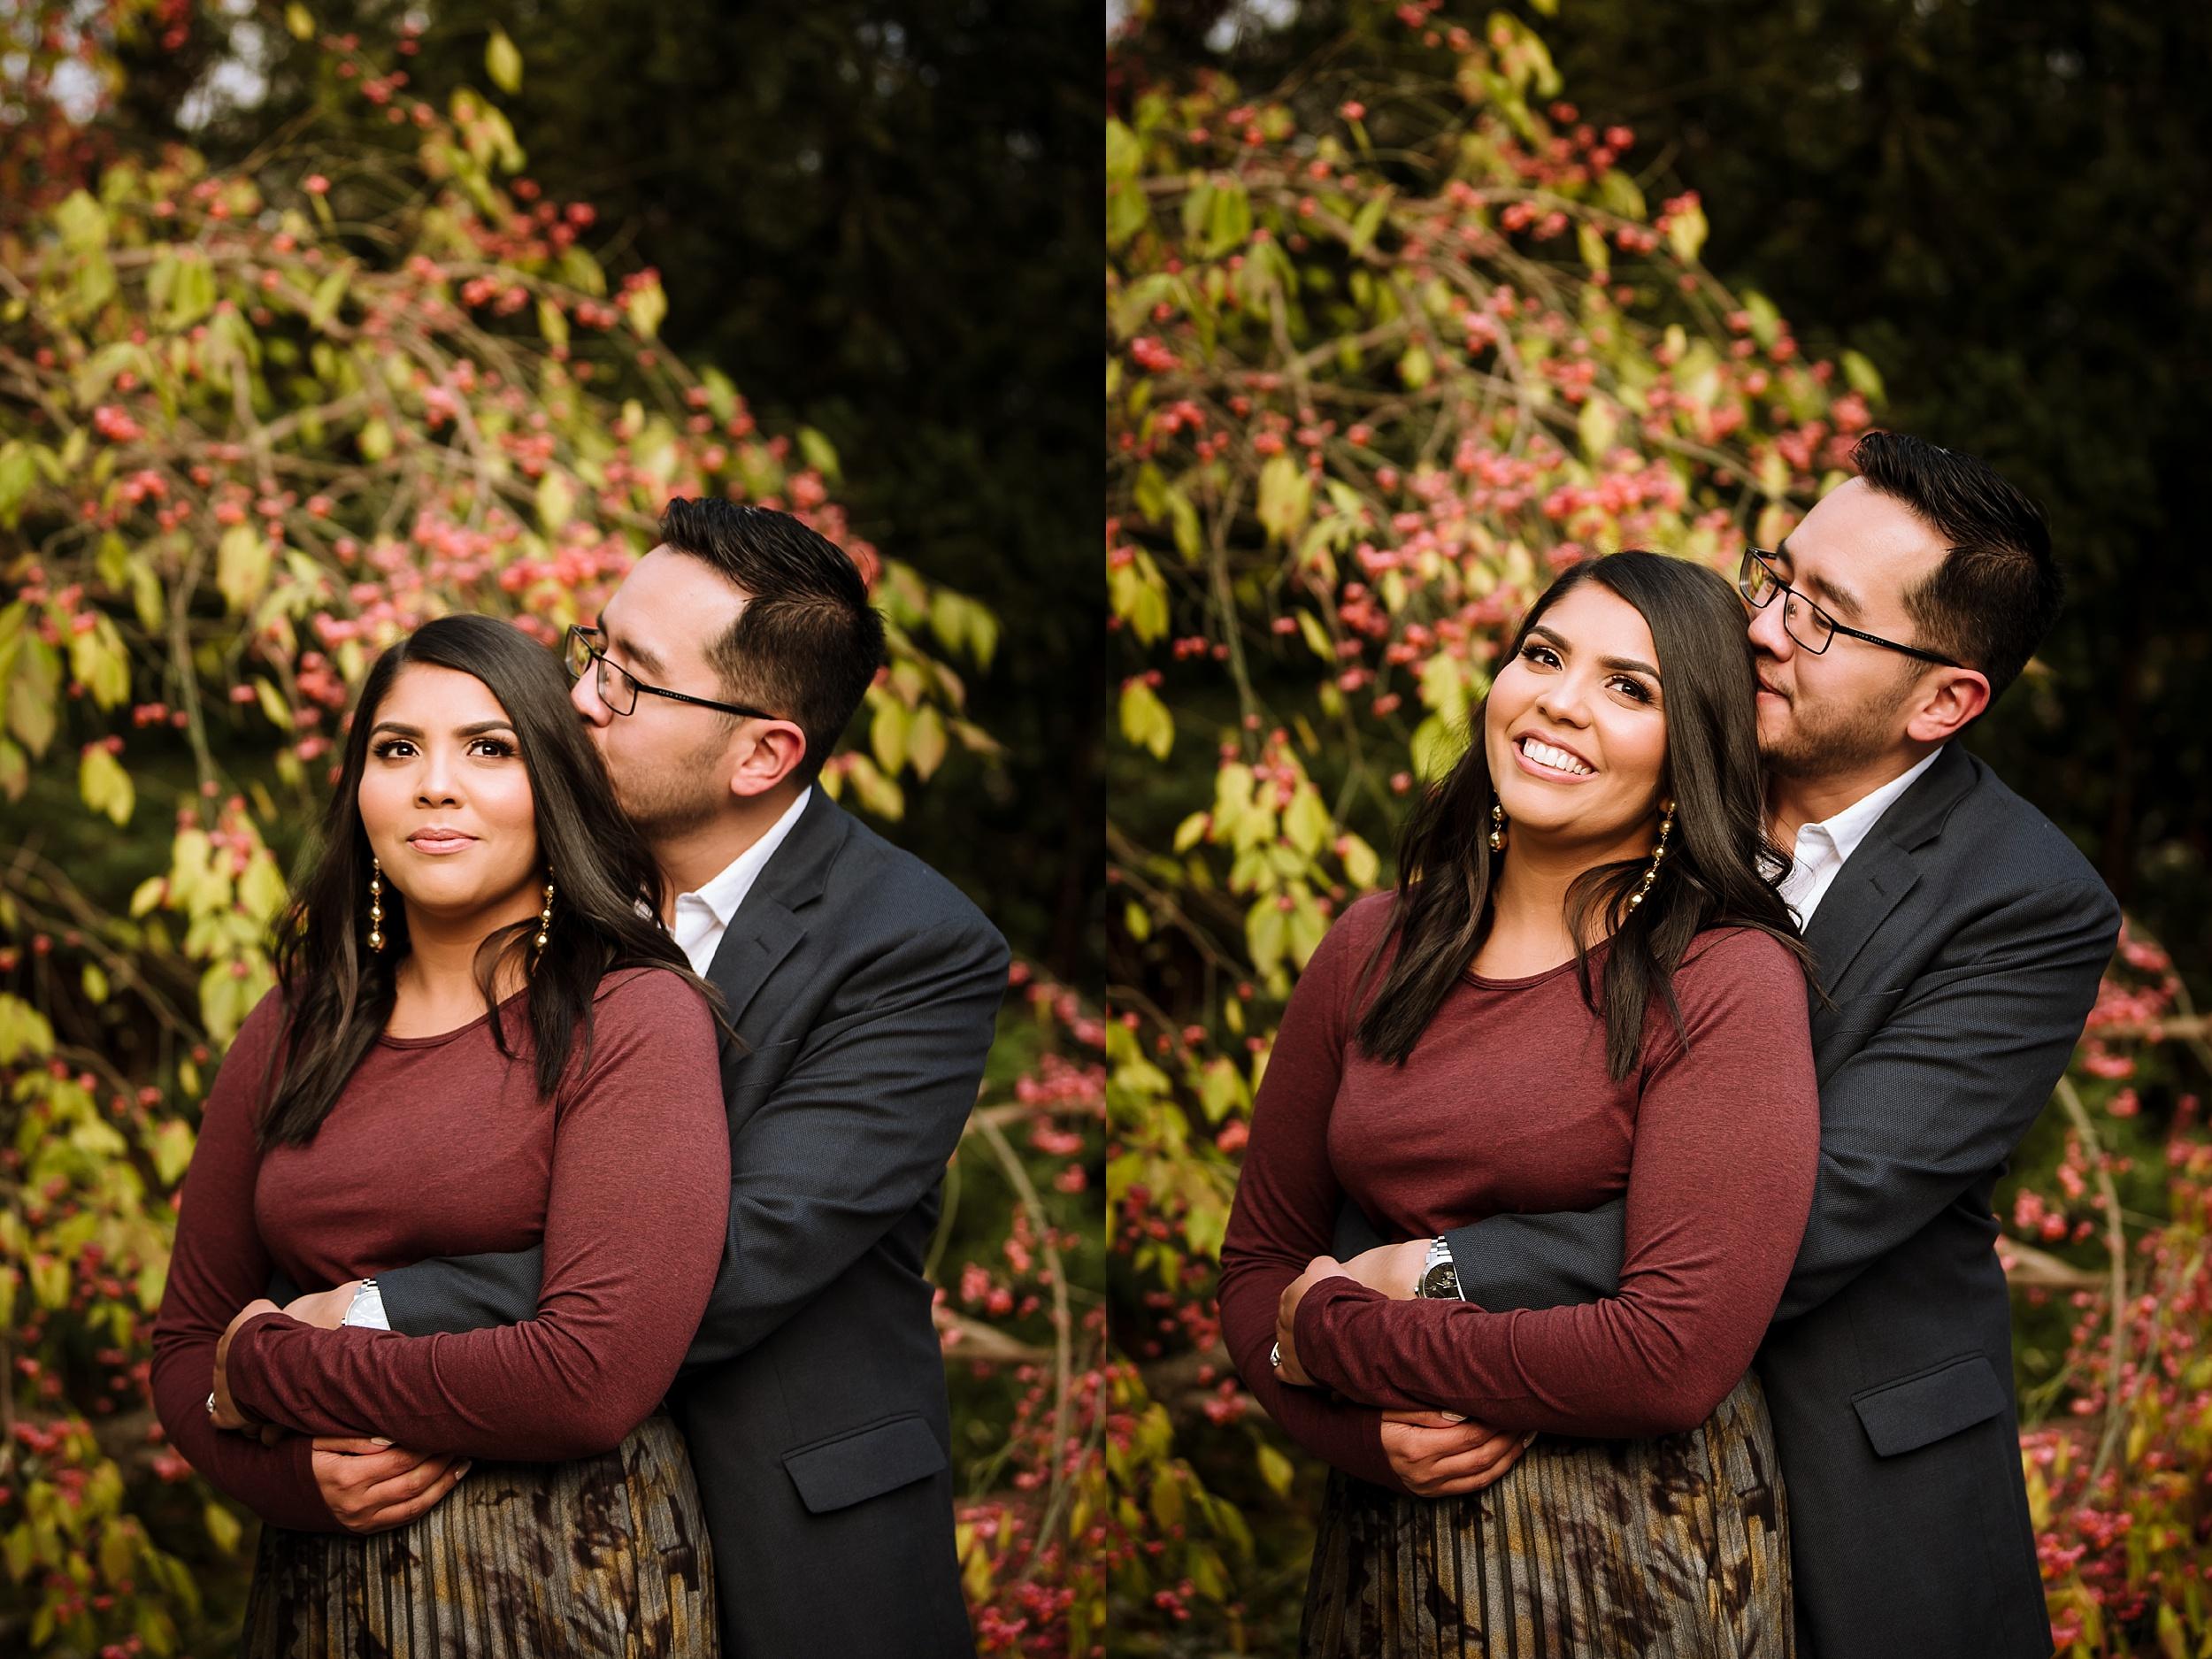 Alexander_Muir_Memorial_Gardens_Engagement_Shoot_Toronto_Wedding_Photographer_0017.jpg